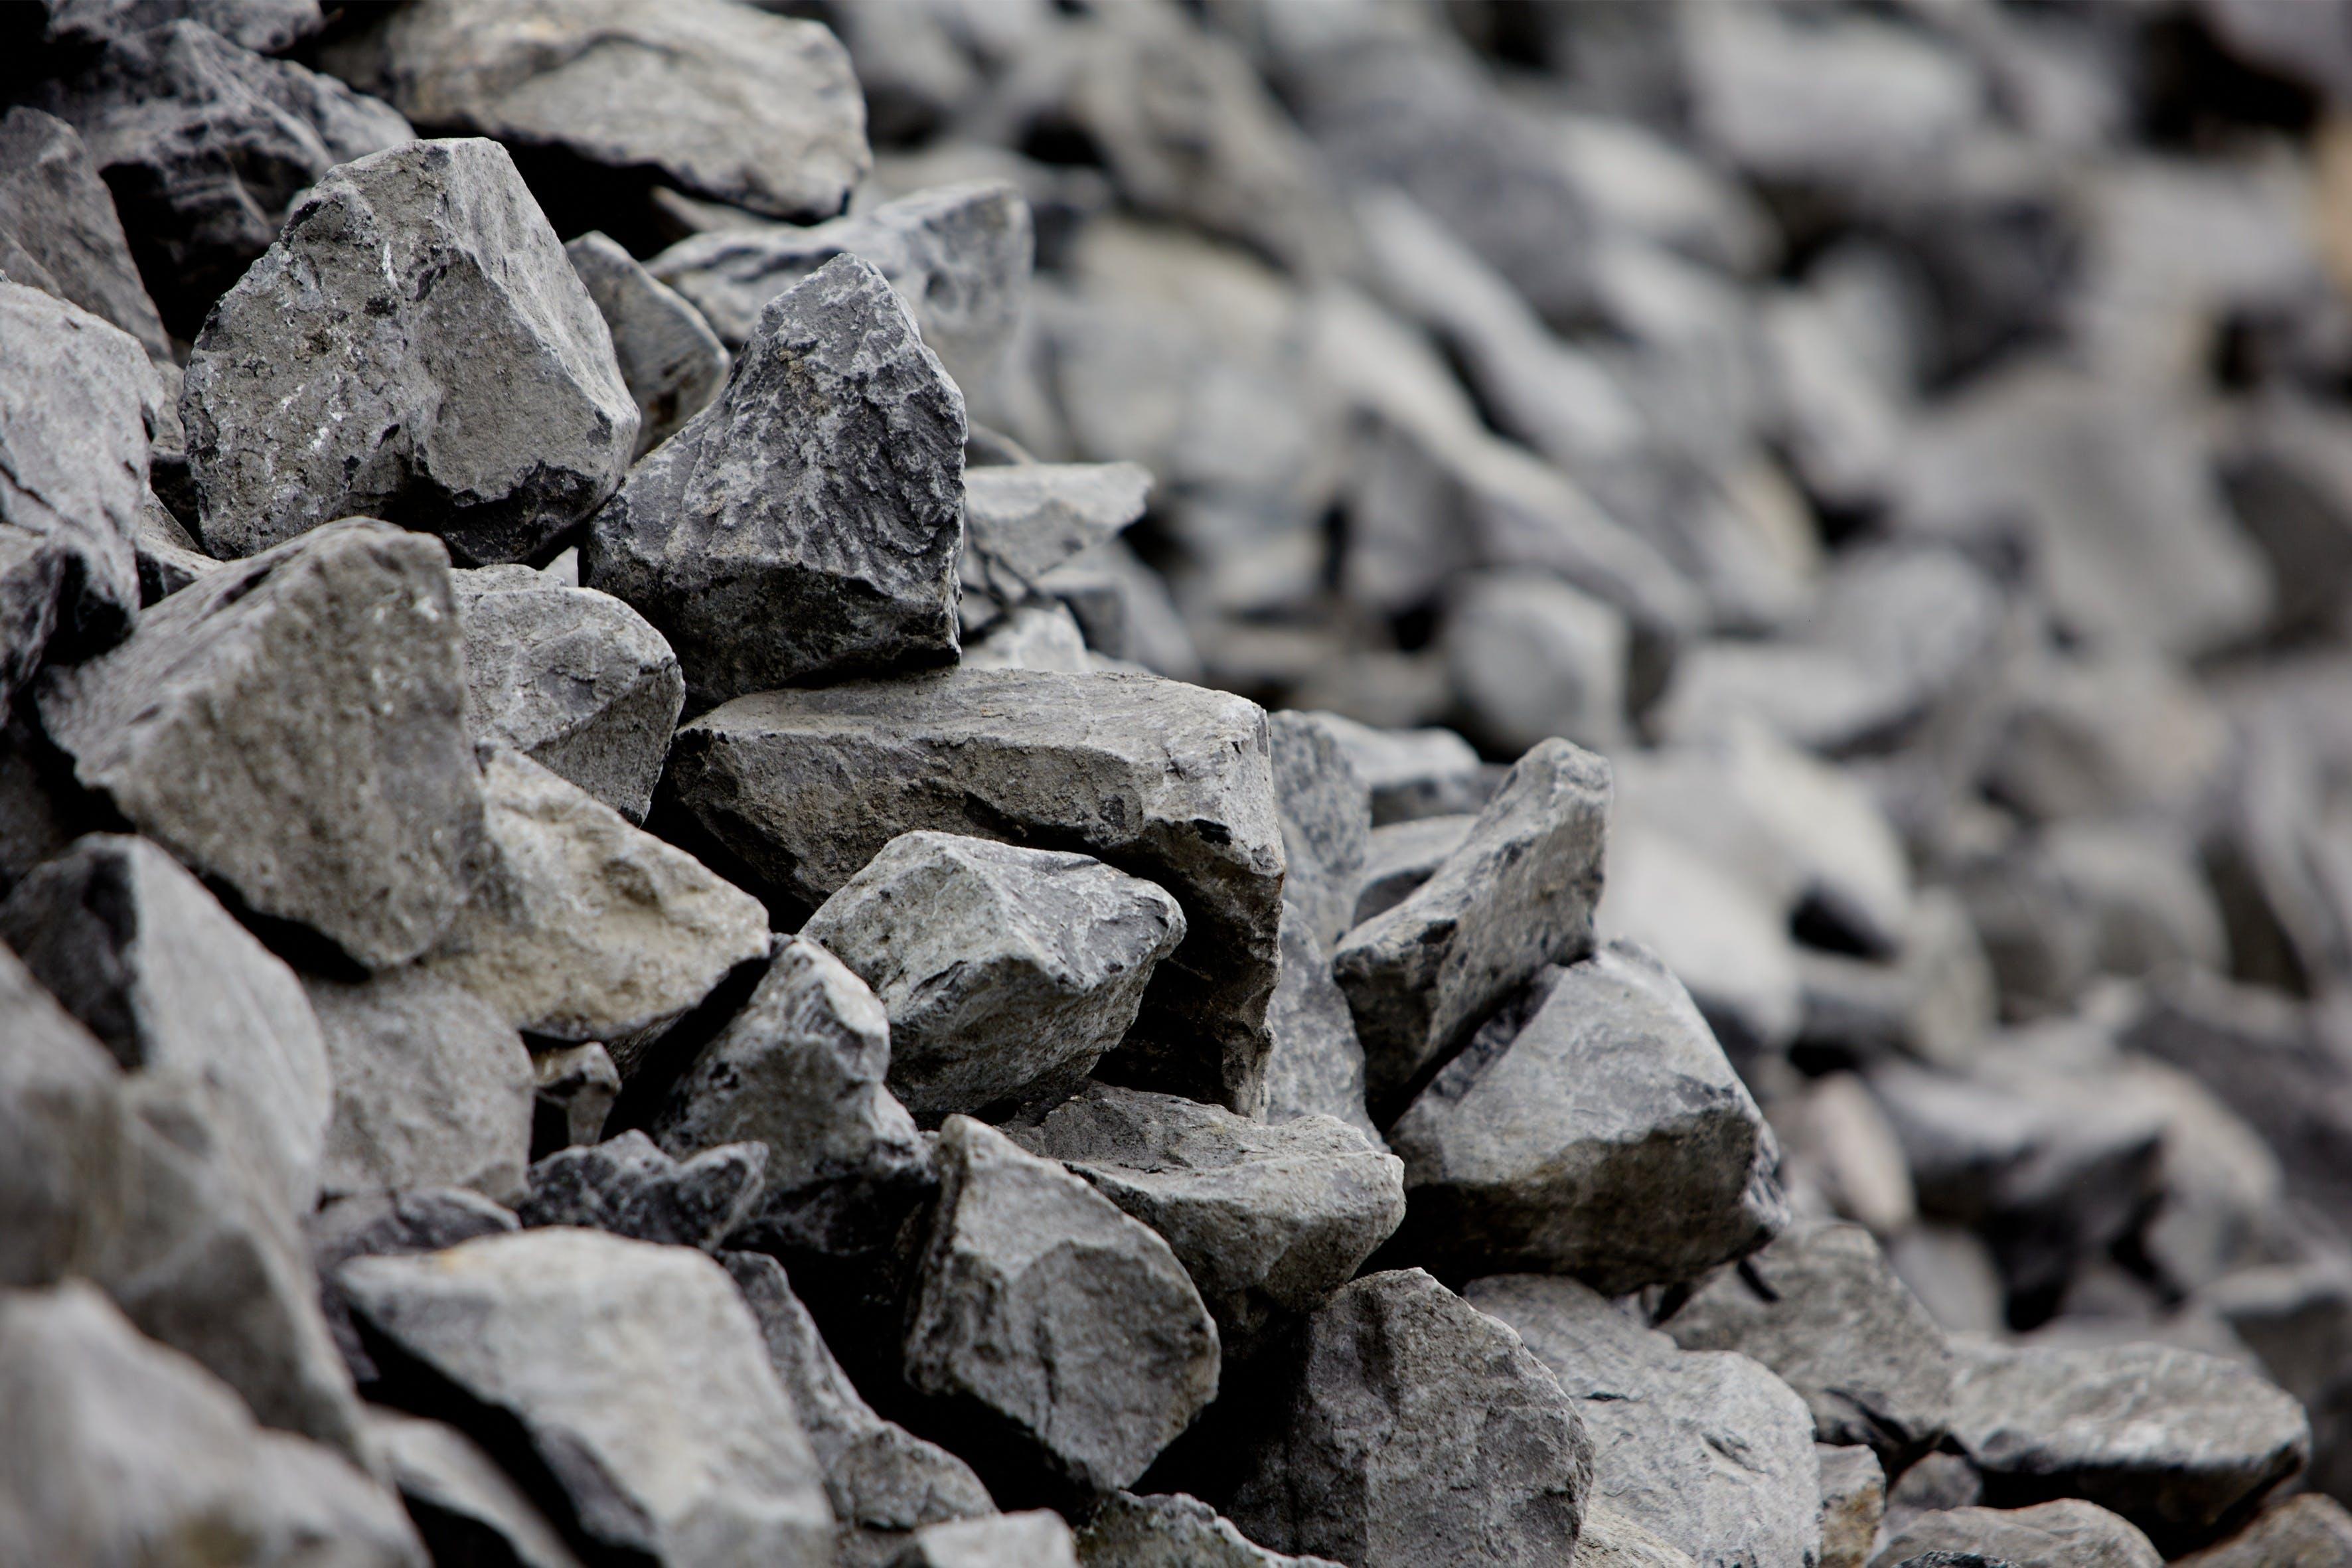 stones, basalt, photo, germany, BuR